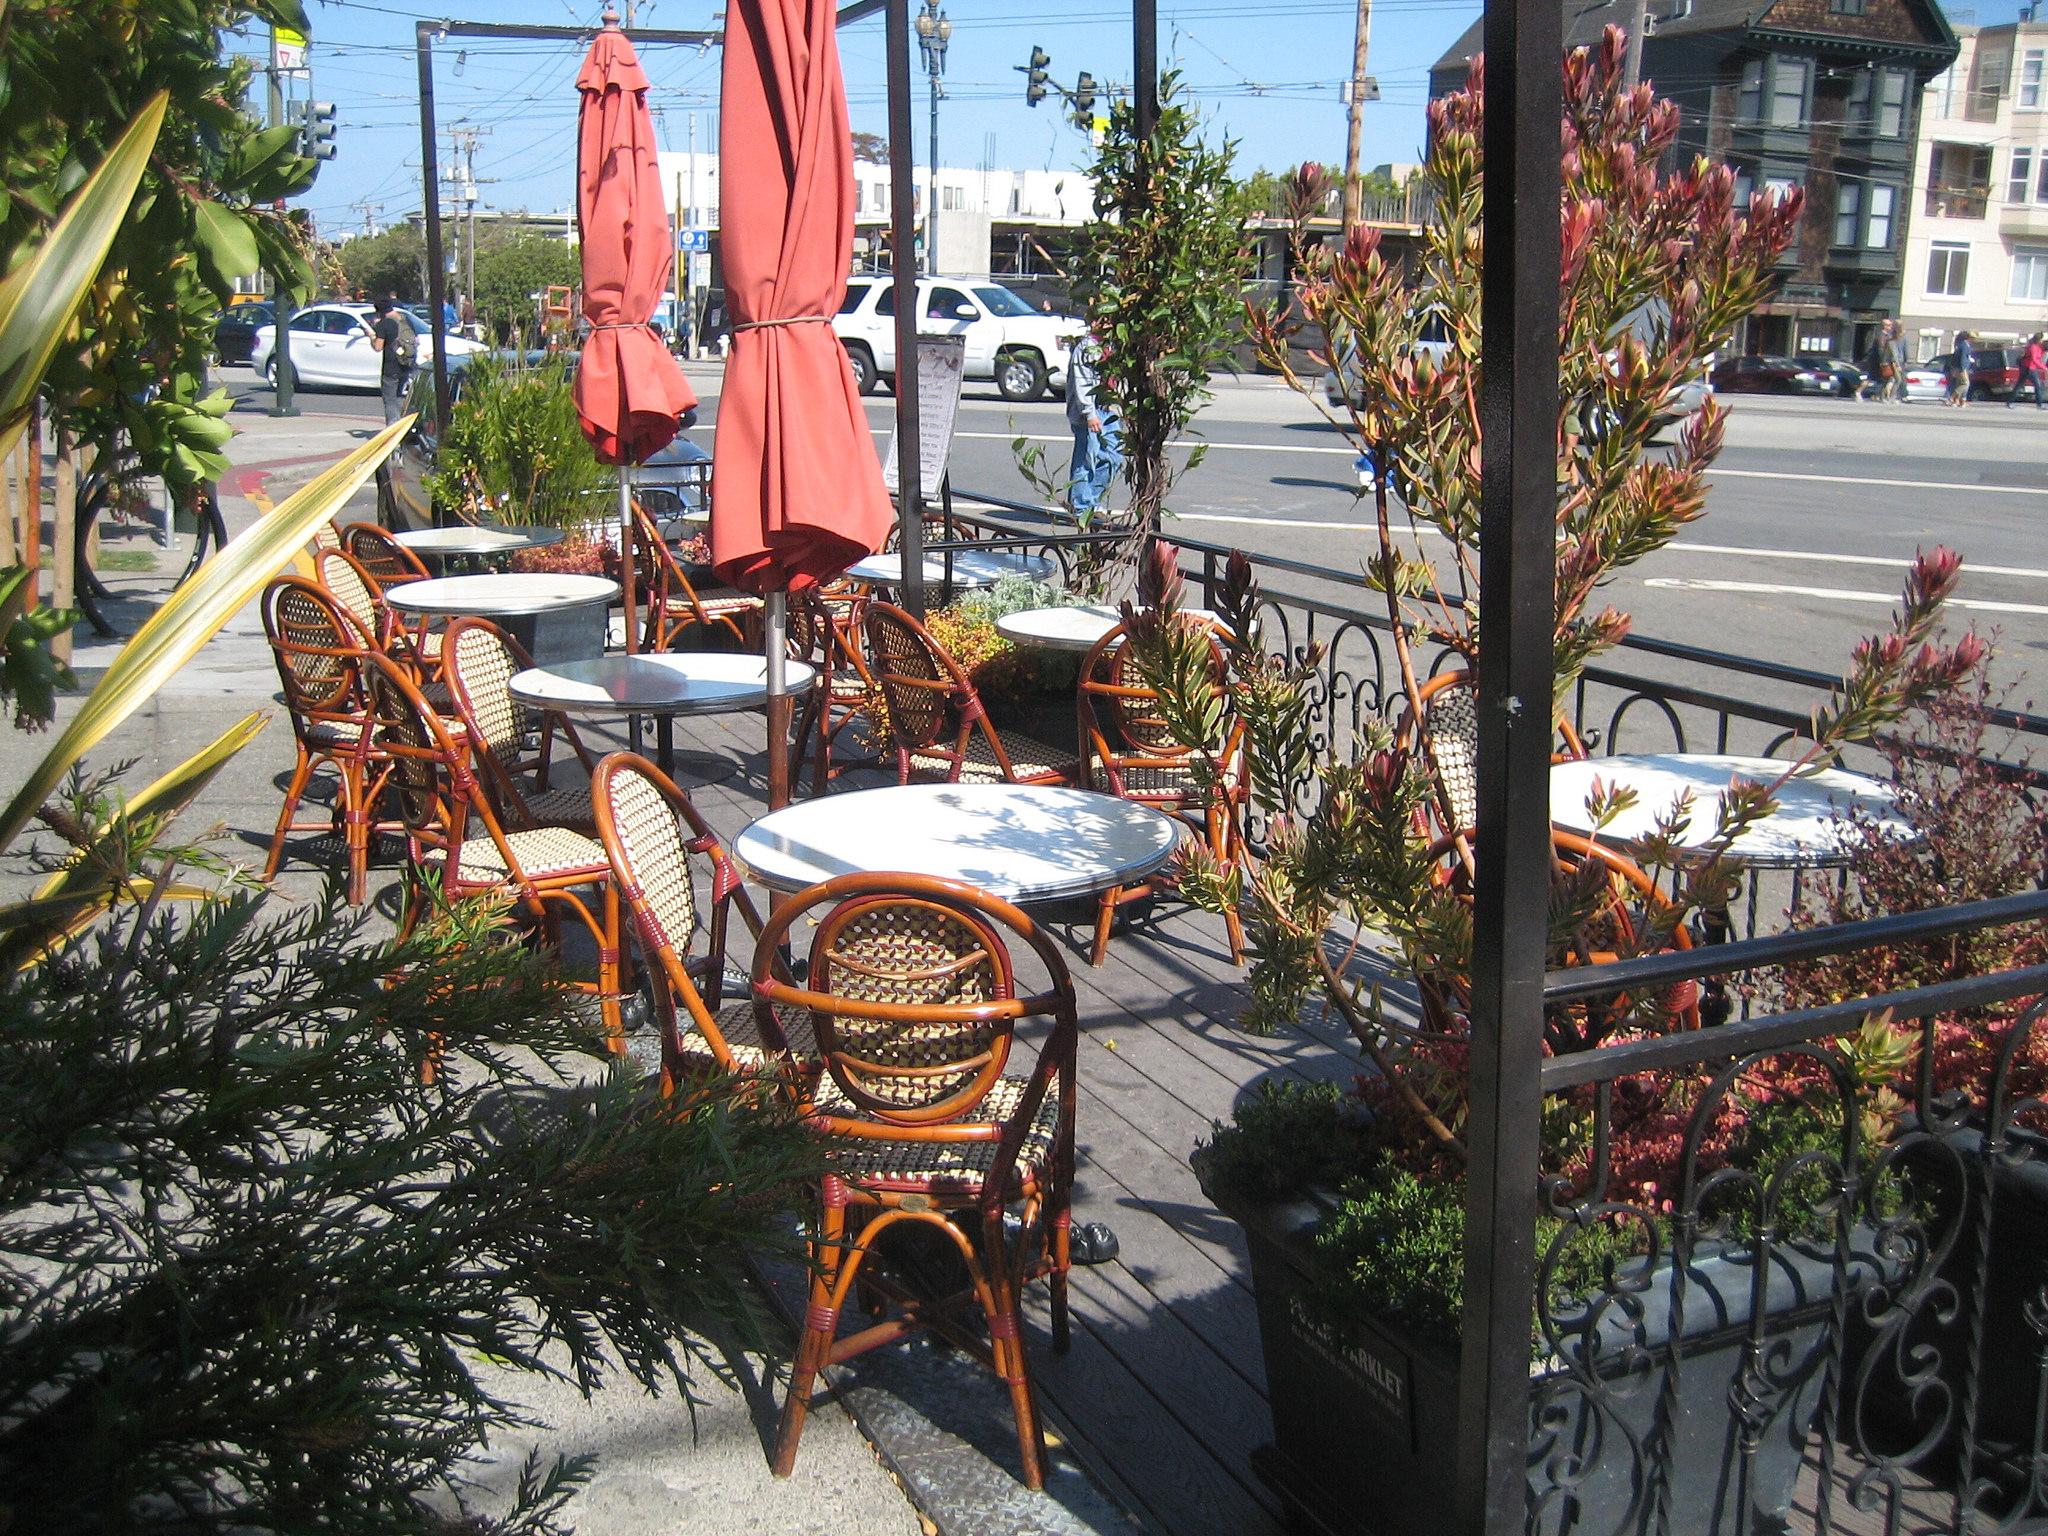 Squat & Gobble Cafe & Creperie Parklet at 3600 16th St © San Francisco Planning Development's Photostream/Flickr